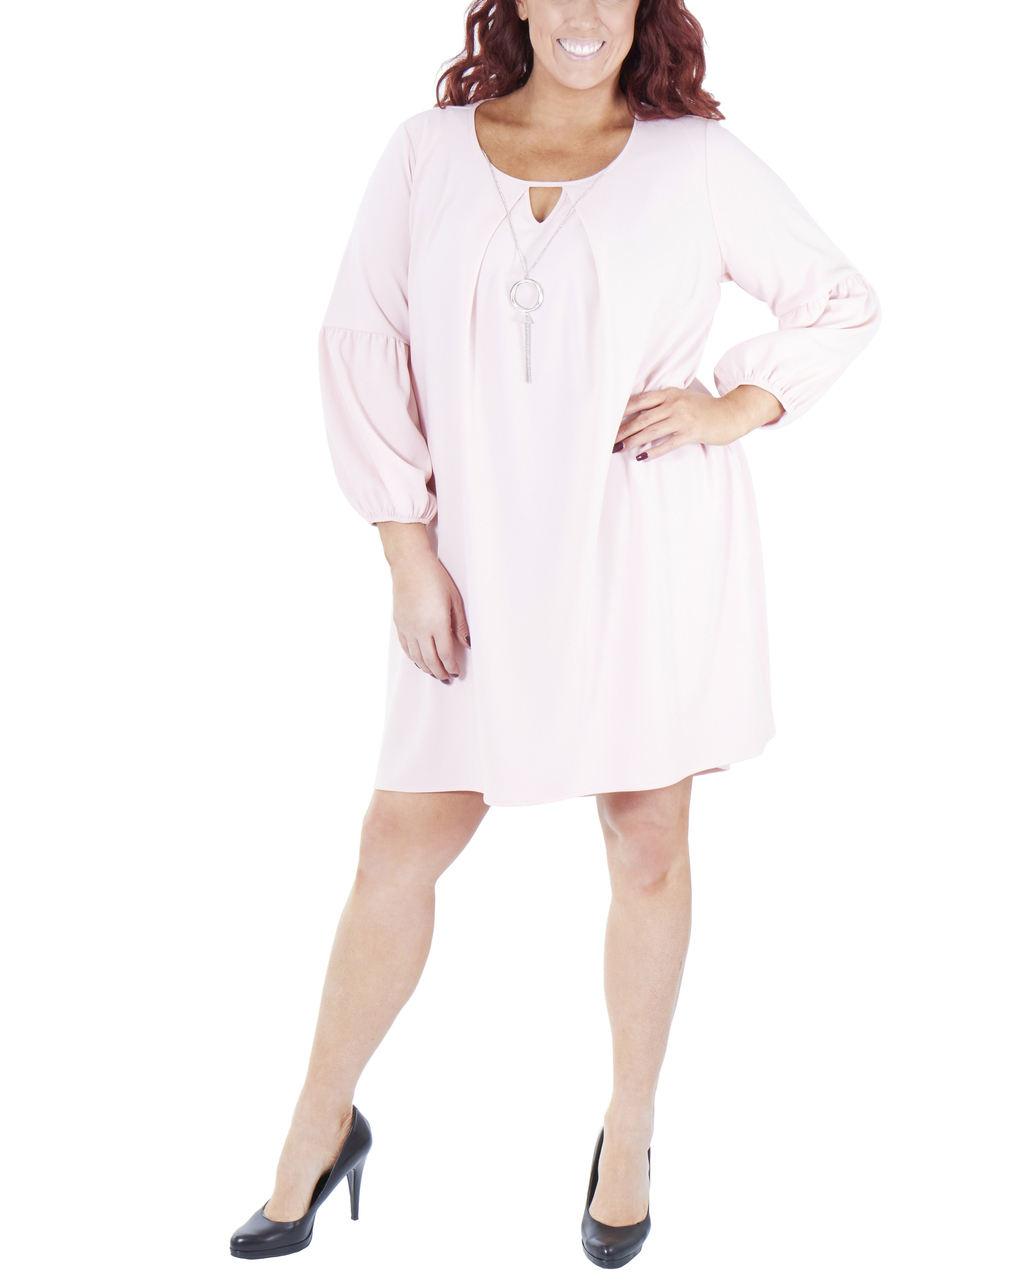 Plus Size Long Sleeve Scoop Neck High-Low Dress~Blush*WNKD0442